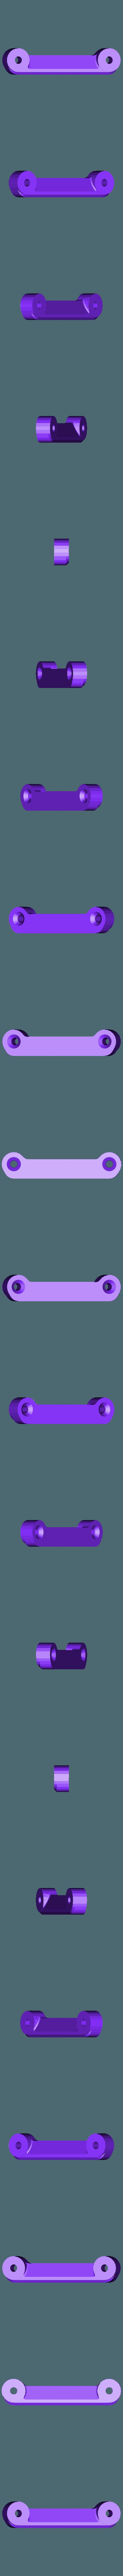 Front shocks mount string.STL Download free STL file 1/10 RC 4WD TRUGGY BT250.2 • 3D printer object, ivnssnn